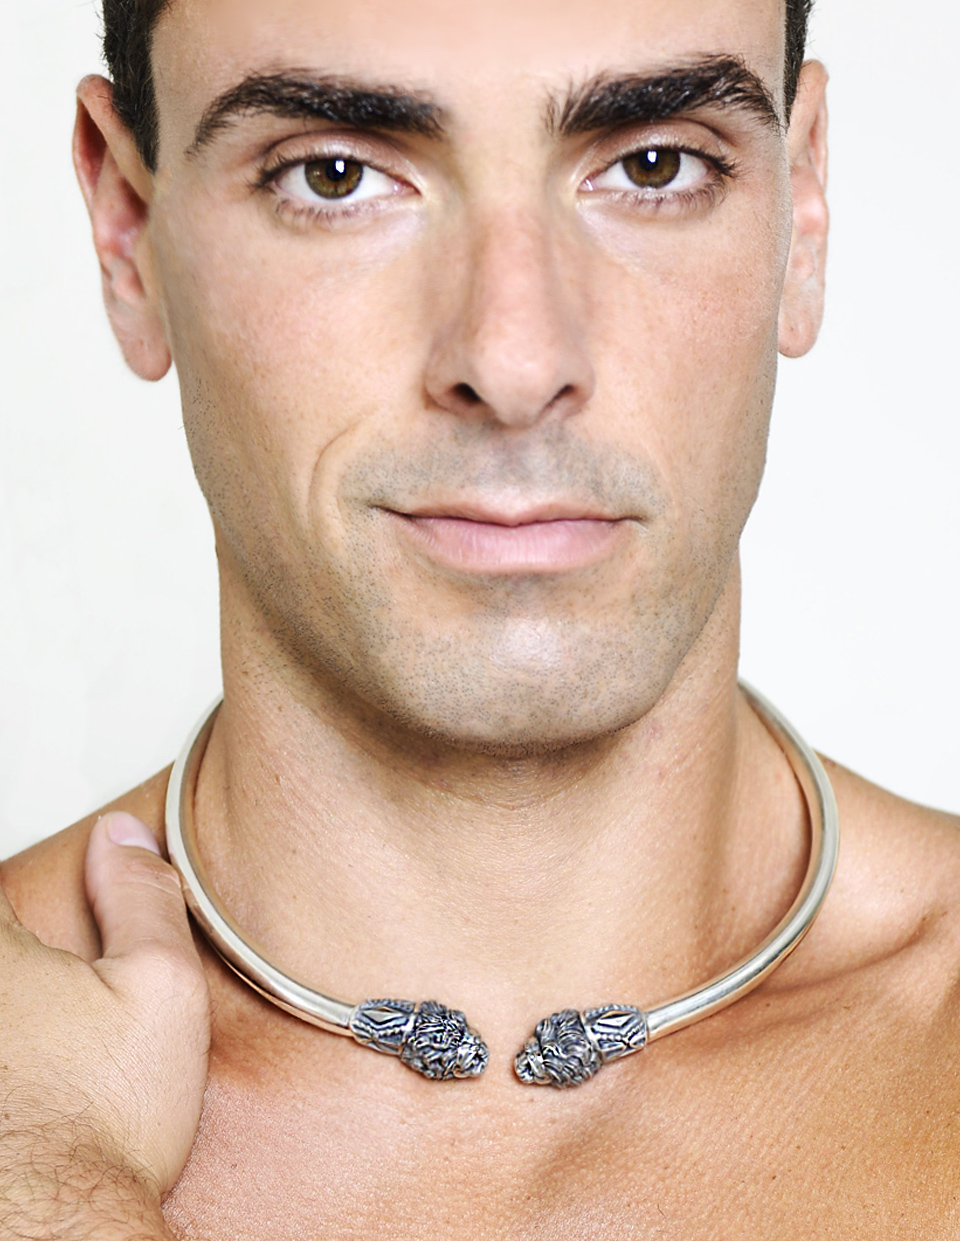 Men's Lion Necklace in Silver. Design by Esculpta. Model Jeremy Bilding